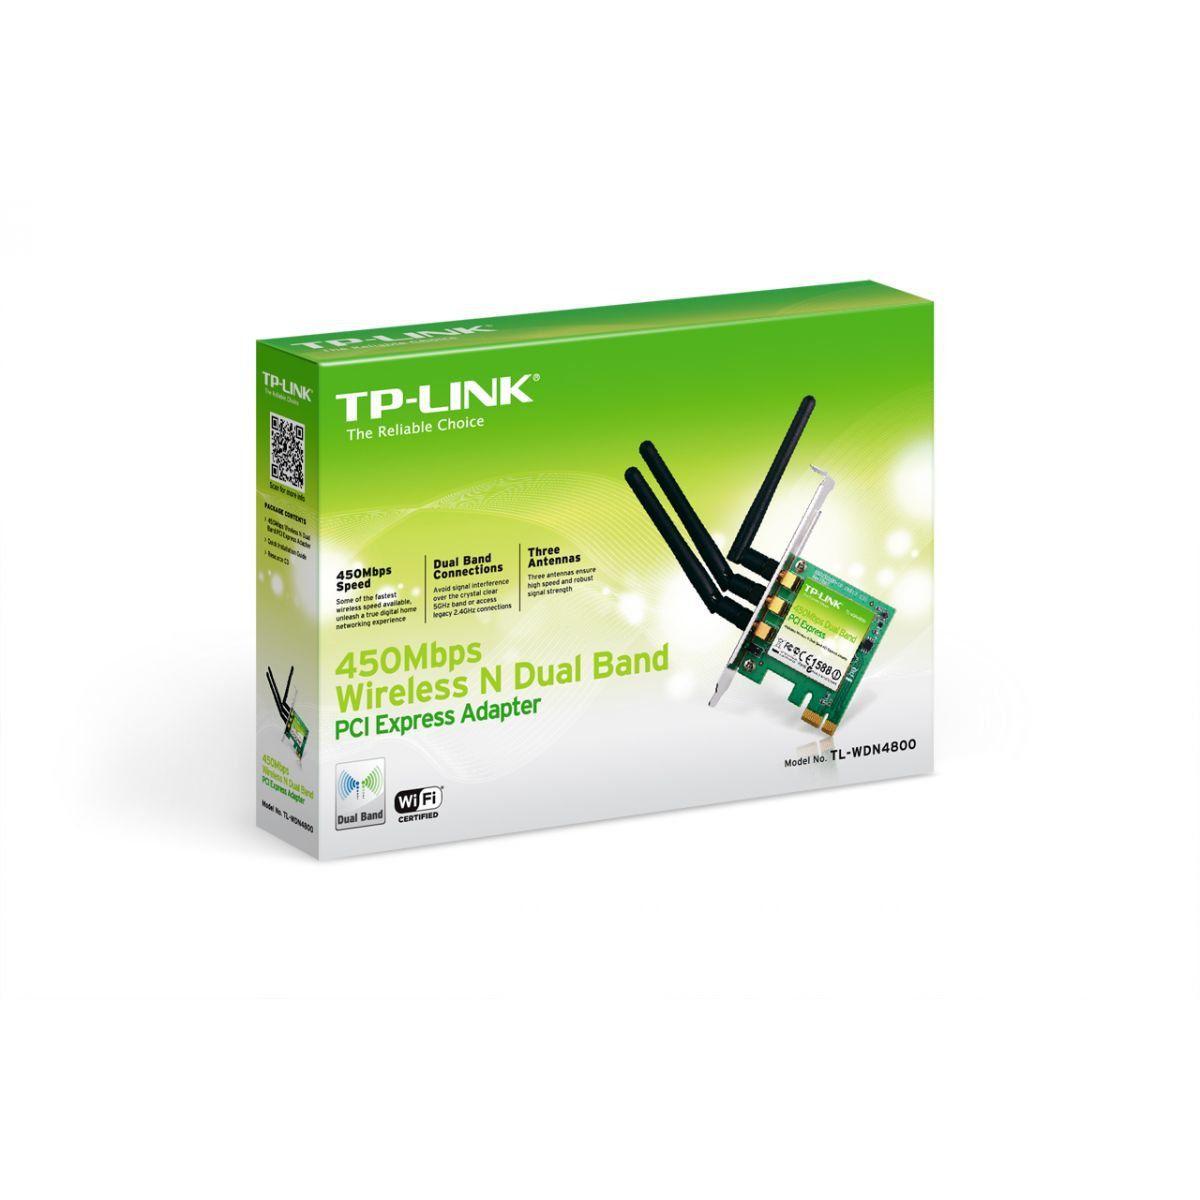 Wireless Adaptador Pci Exp. Tp-Link Tp-Wdn4800 450mbps 3 Antenas